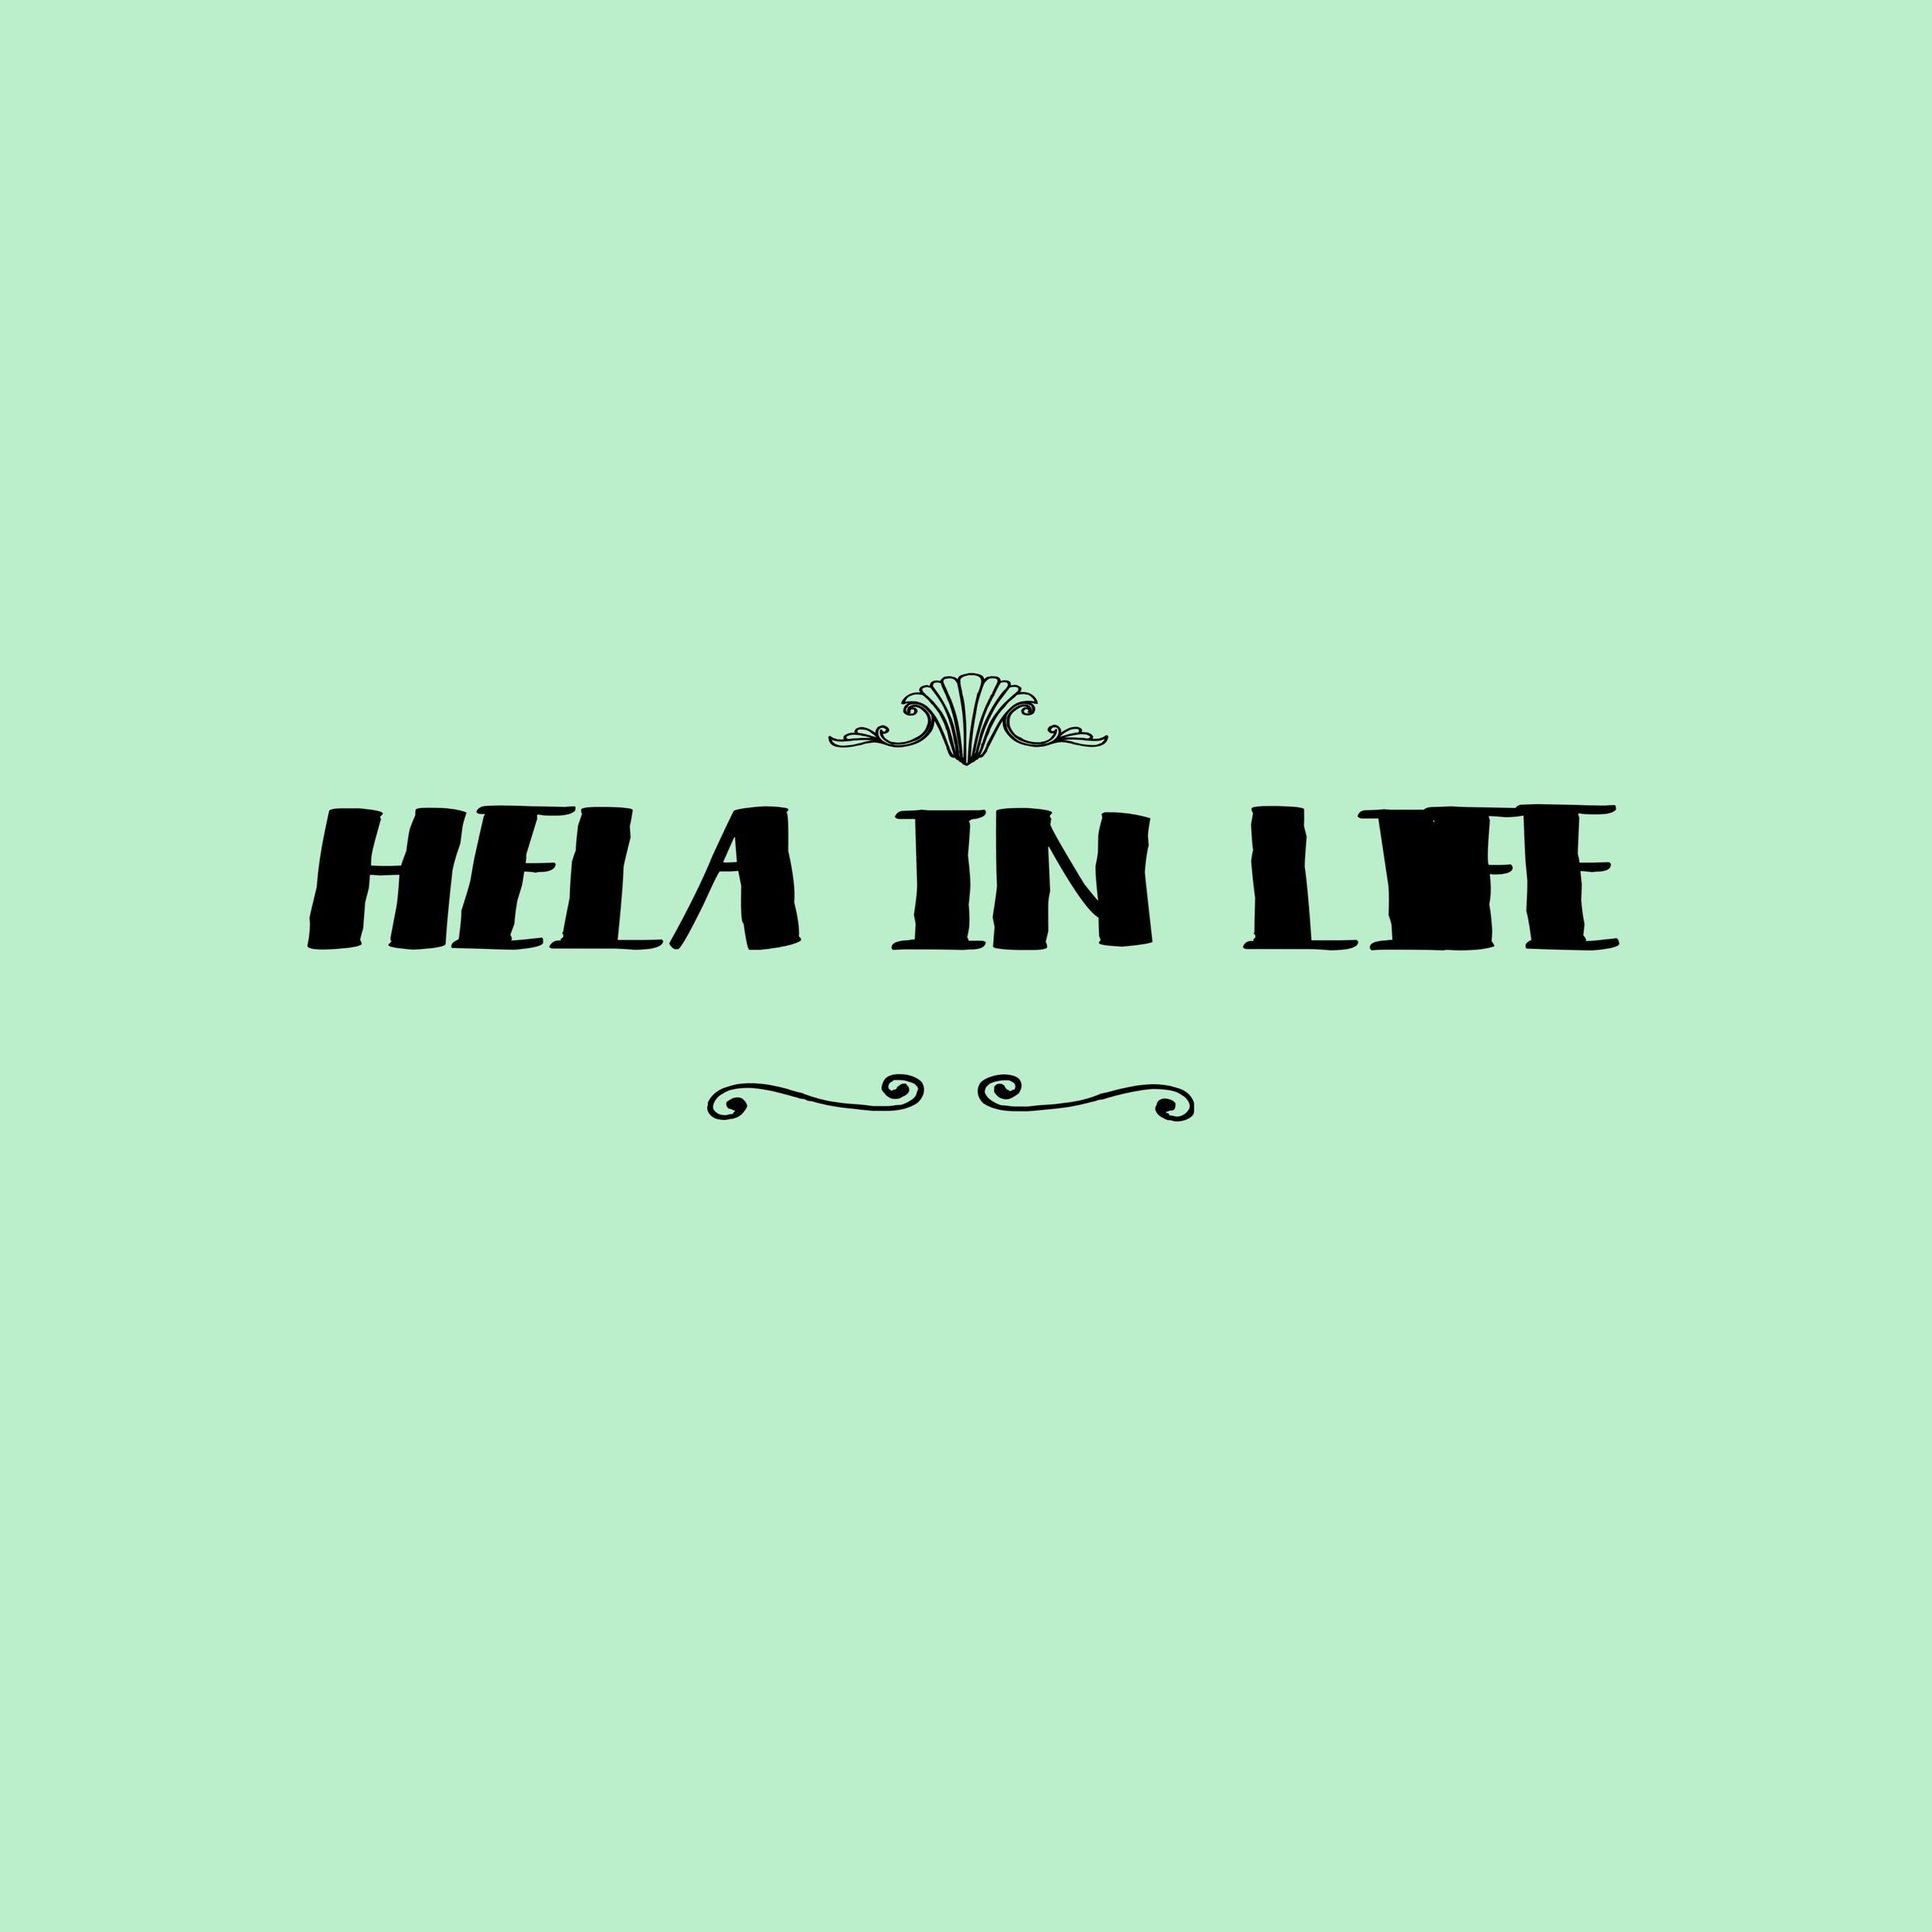 HelainLife